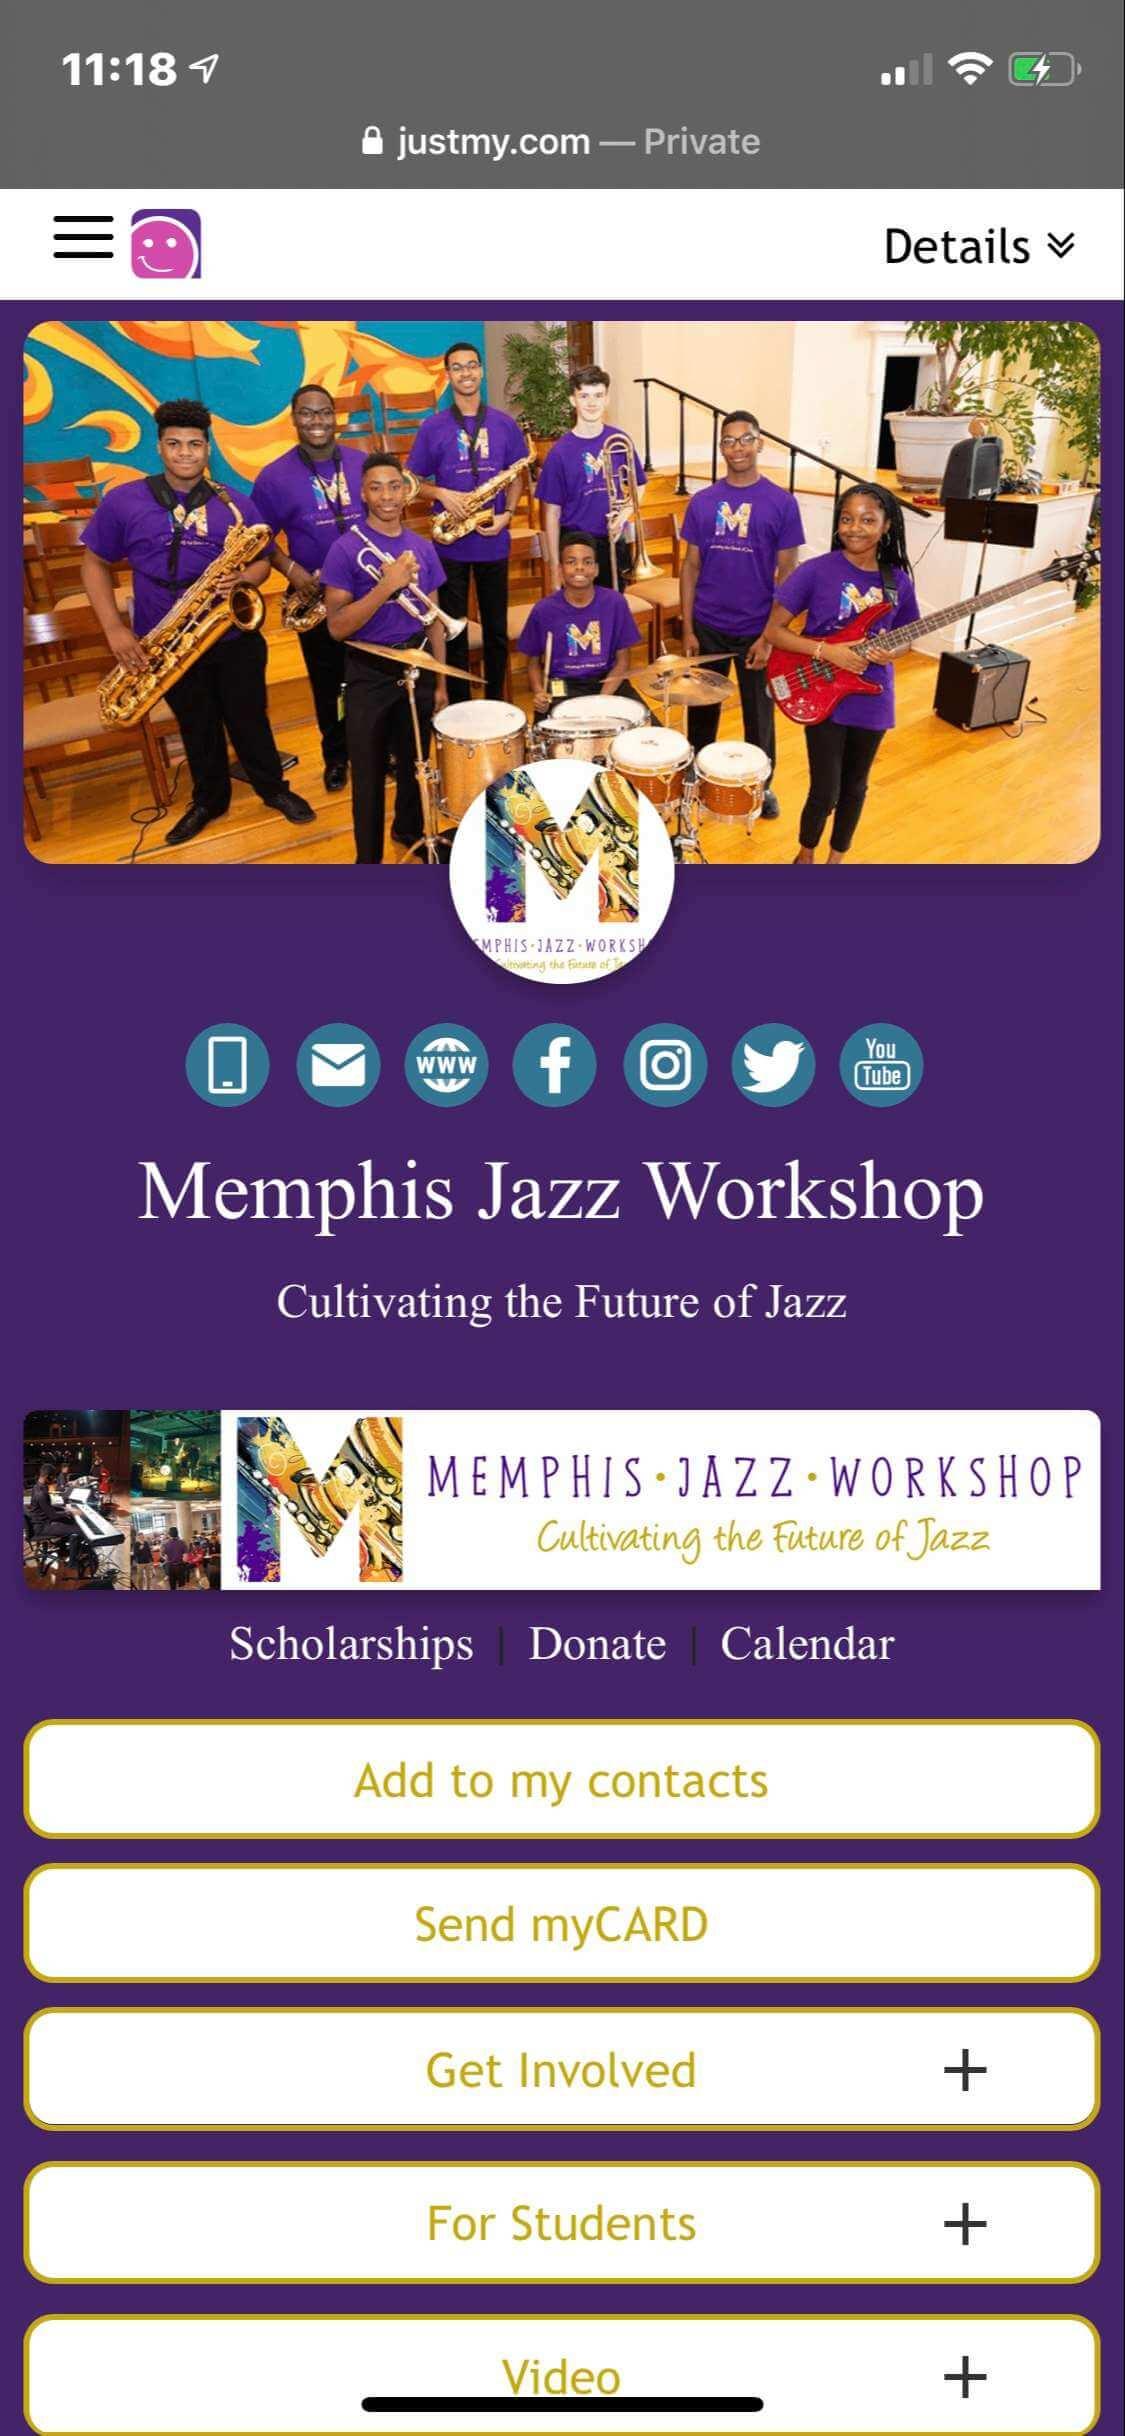 #grabmyCARD  Memphis Jazz Workshop